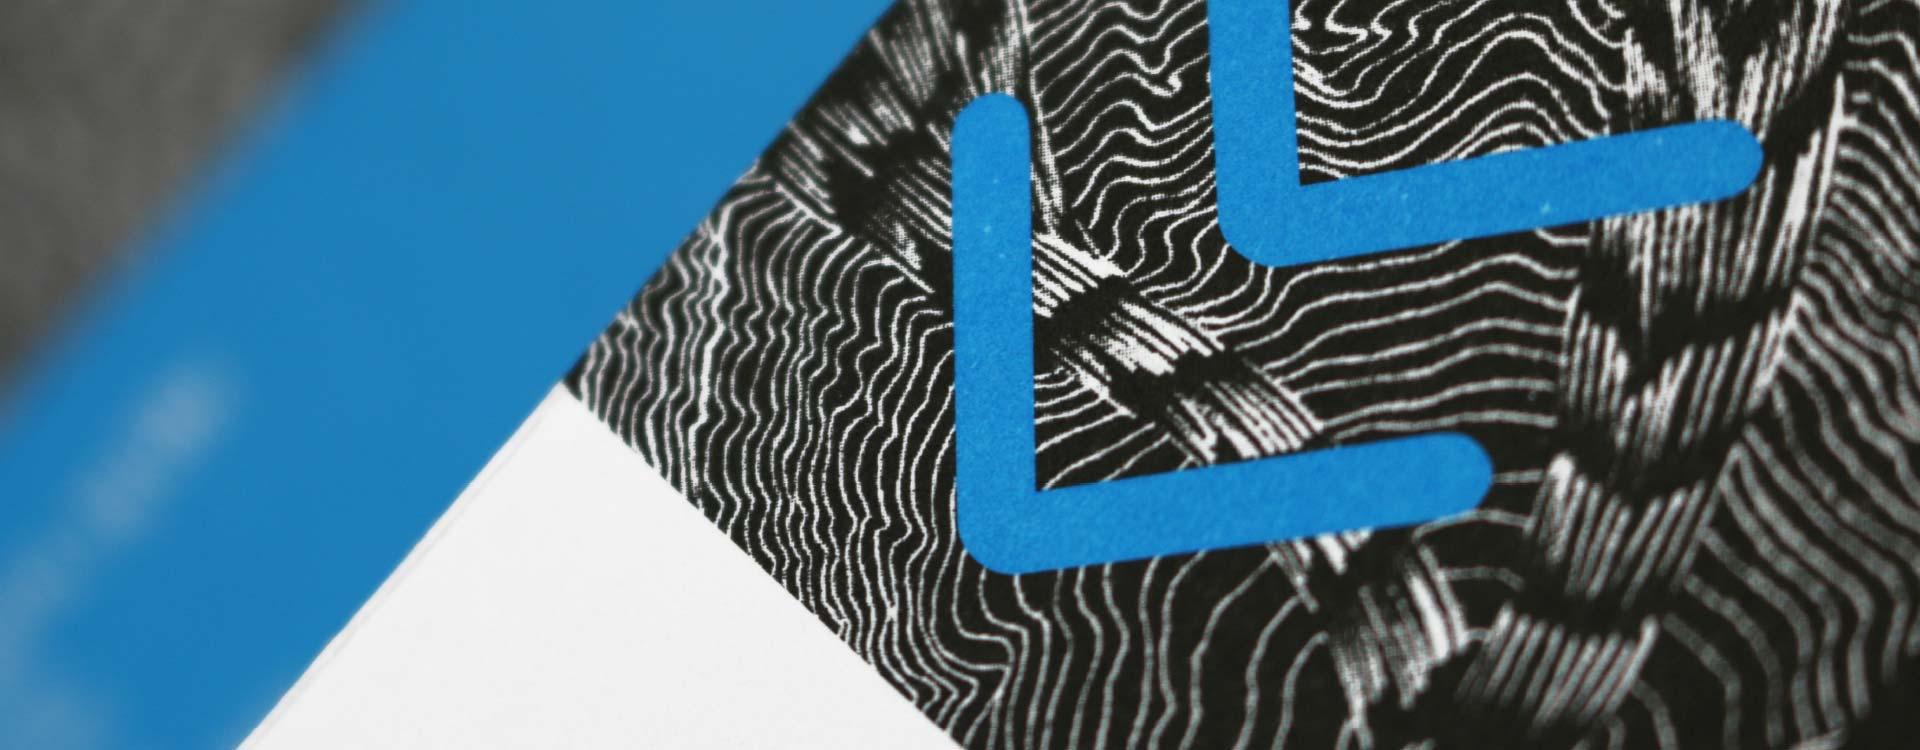 Leaflet for the exhibition Localised Desire in the Alte Feuerwache Project Space Berlin; Design: Kattrin Richter   Graphic Design Studio